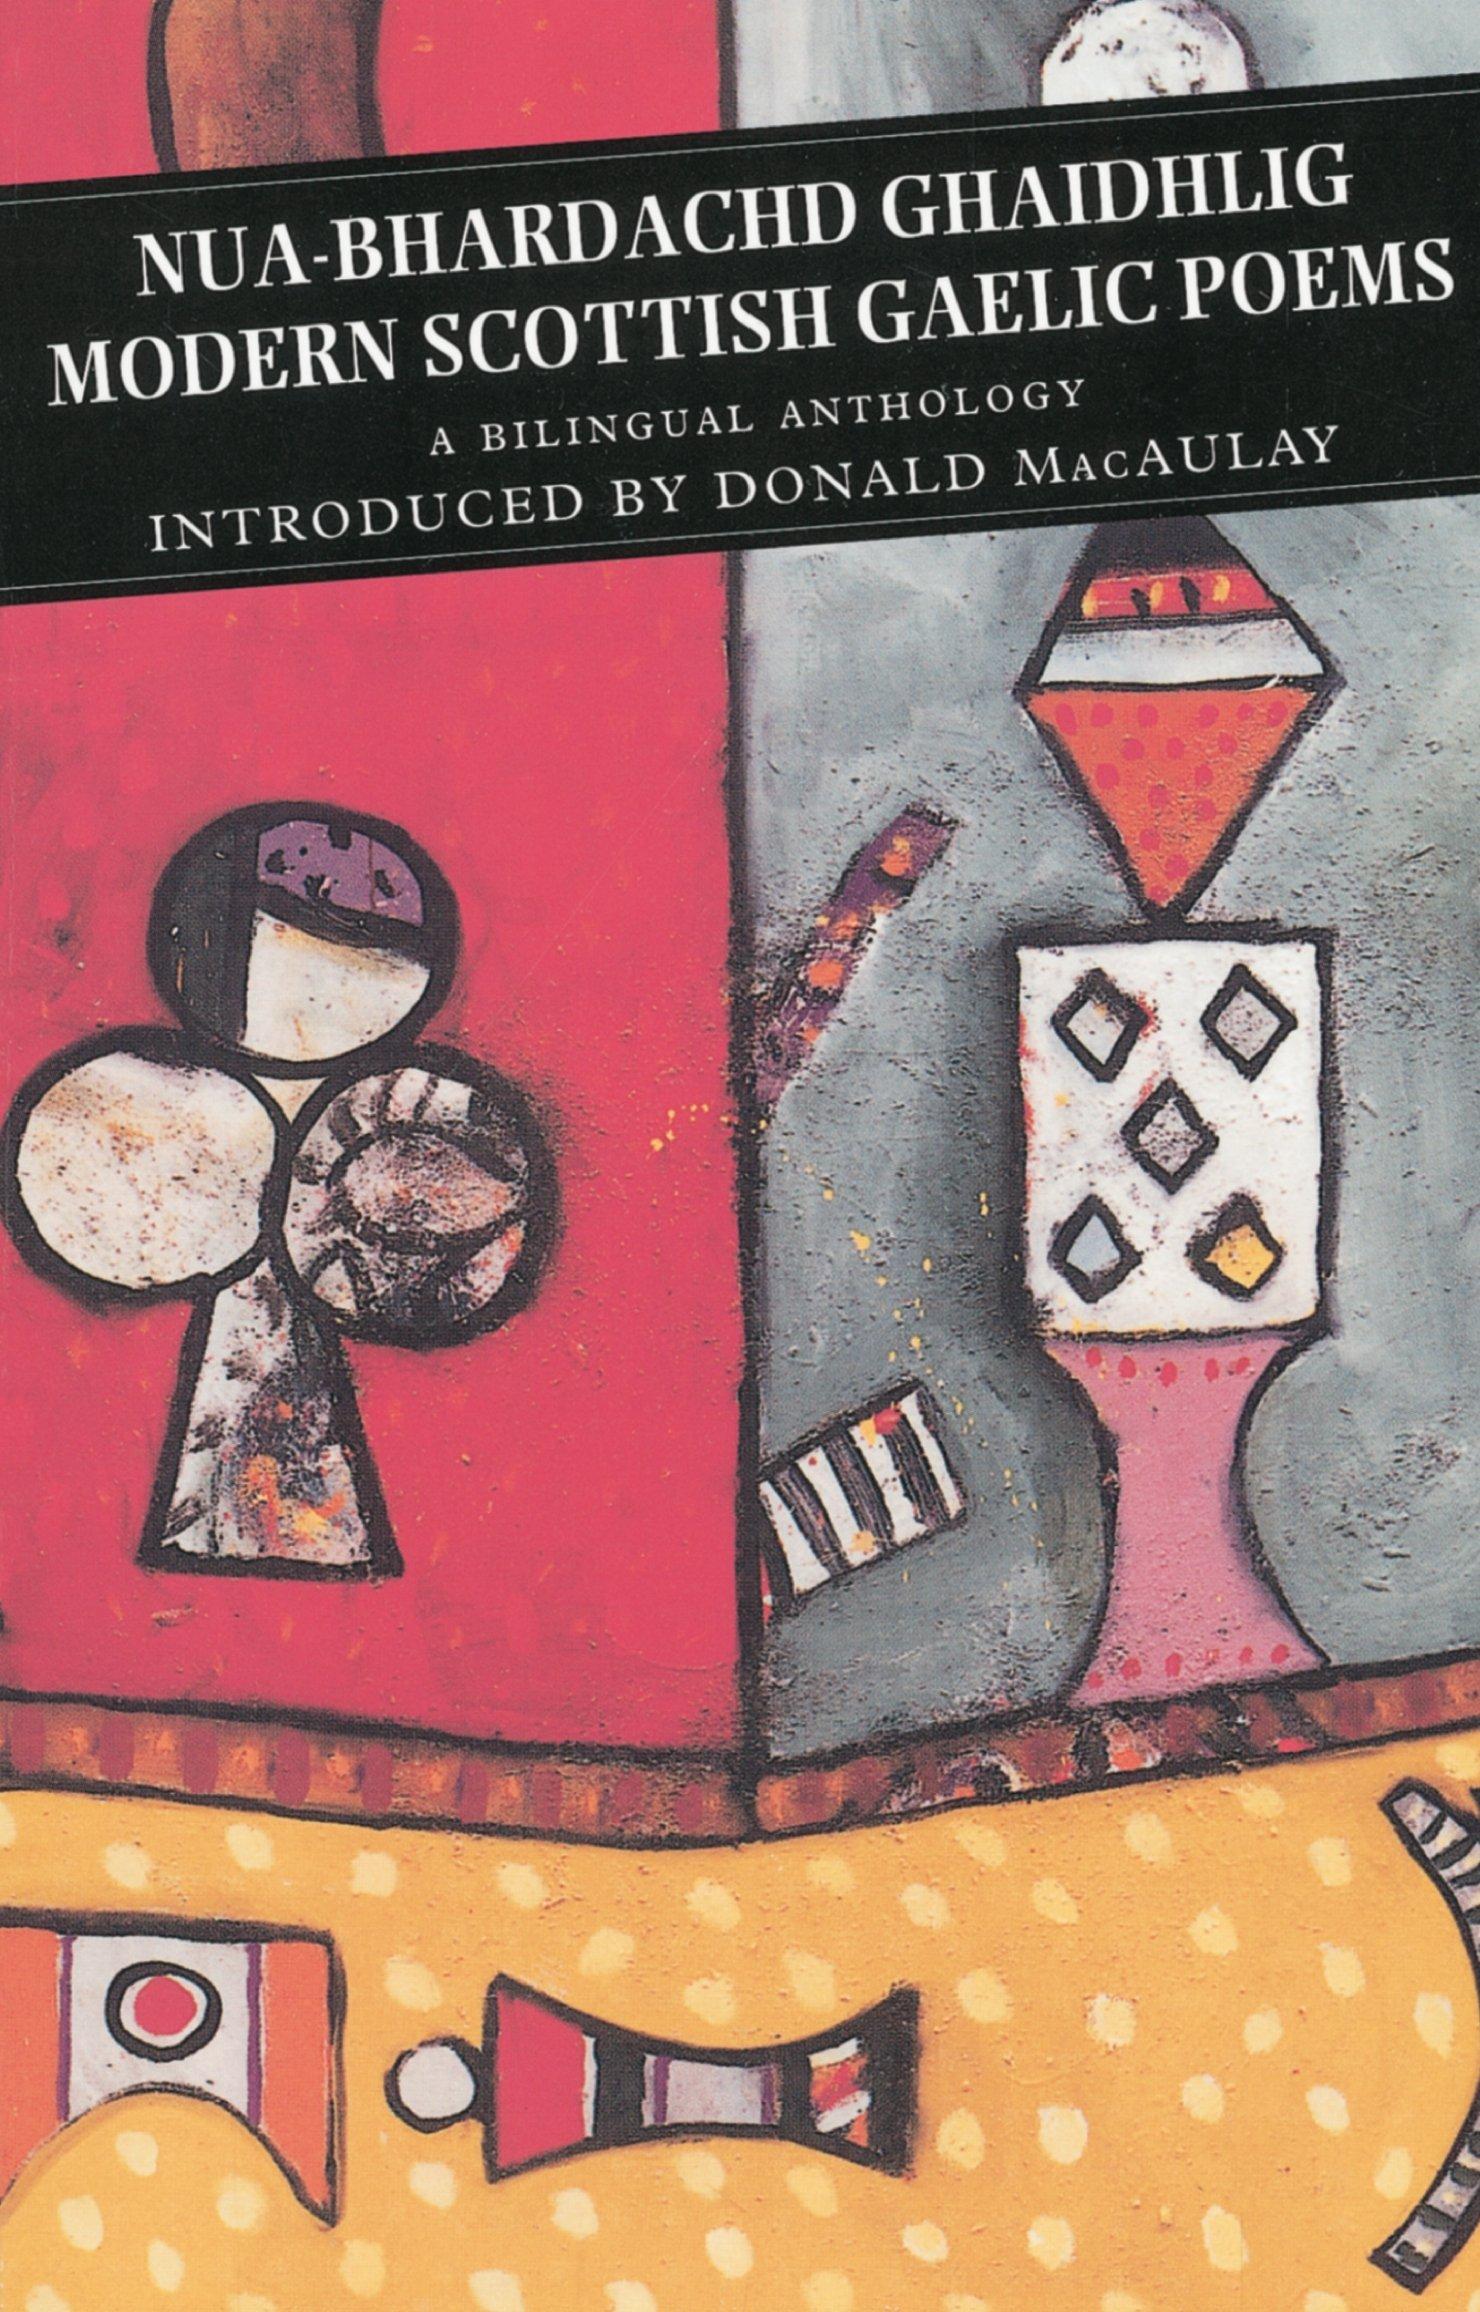 Modern Scottish Gaelic Poems: A Bilingual Anthology (Canongate Classics)